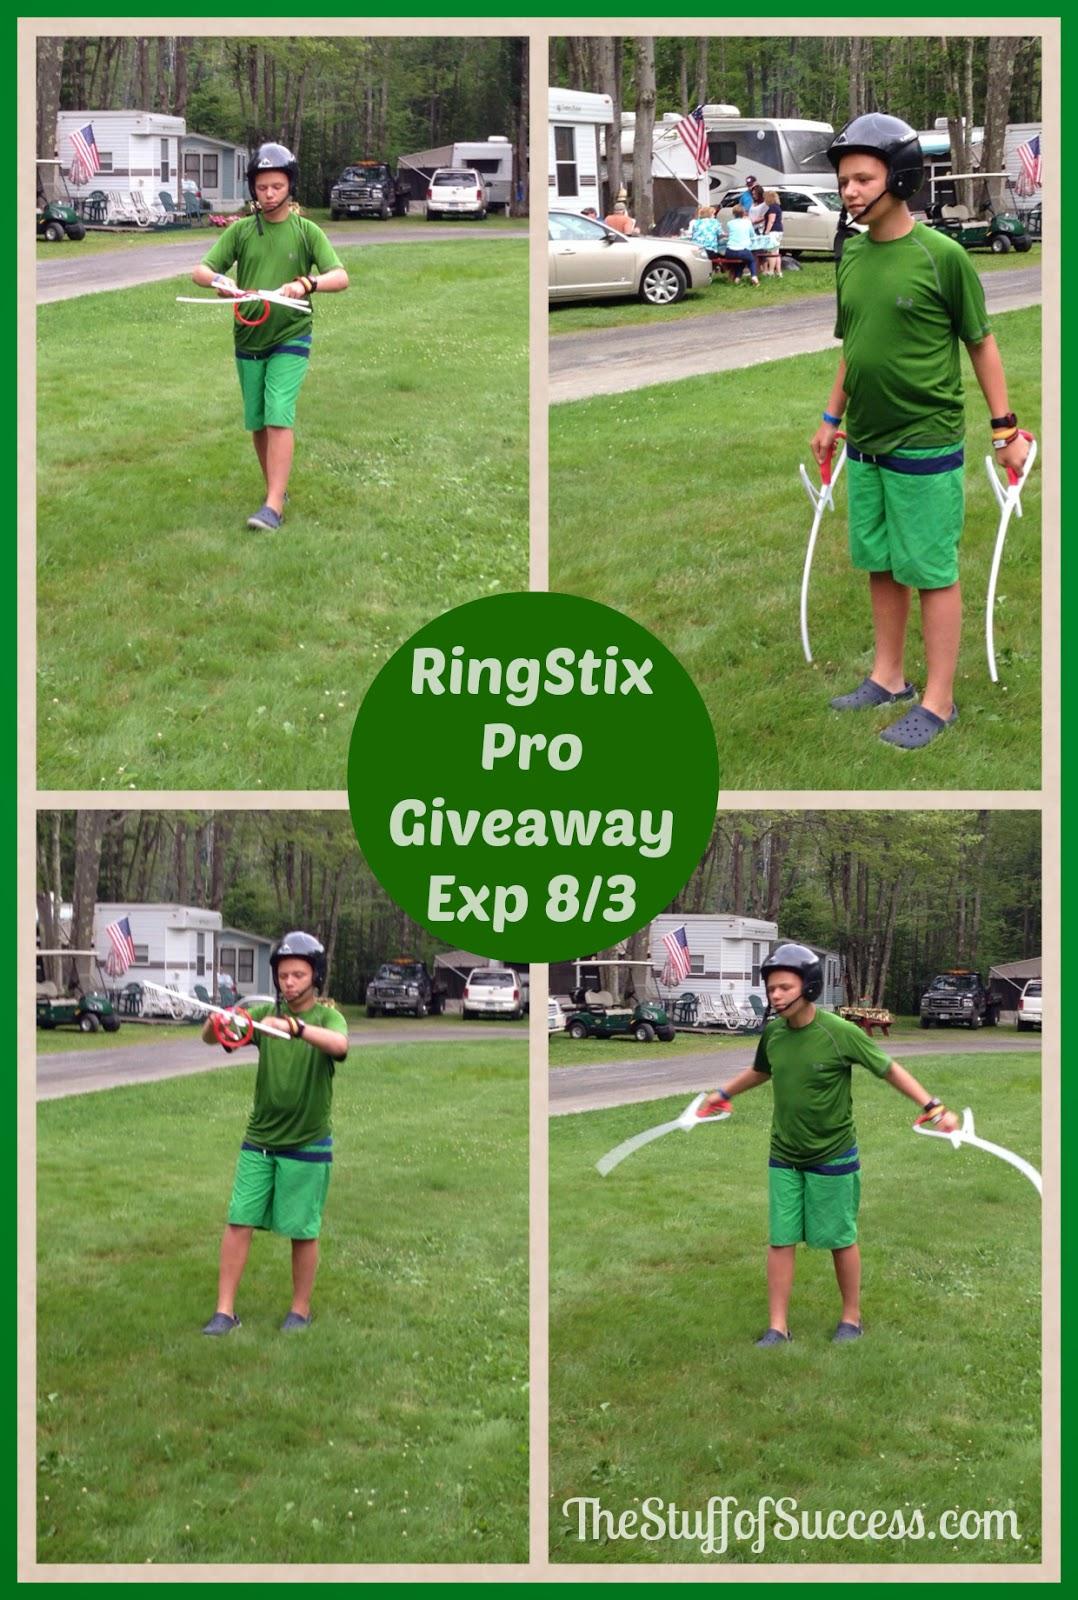 RingStix Pro Giveaway